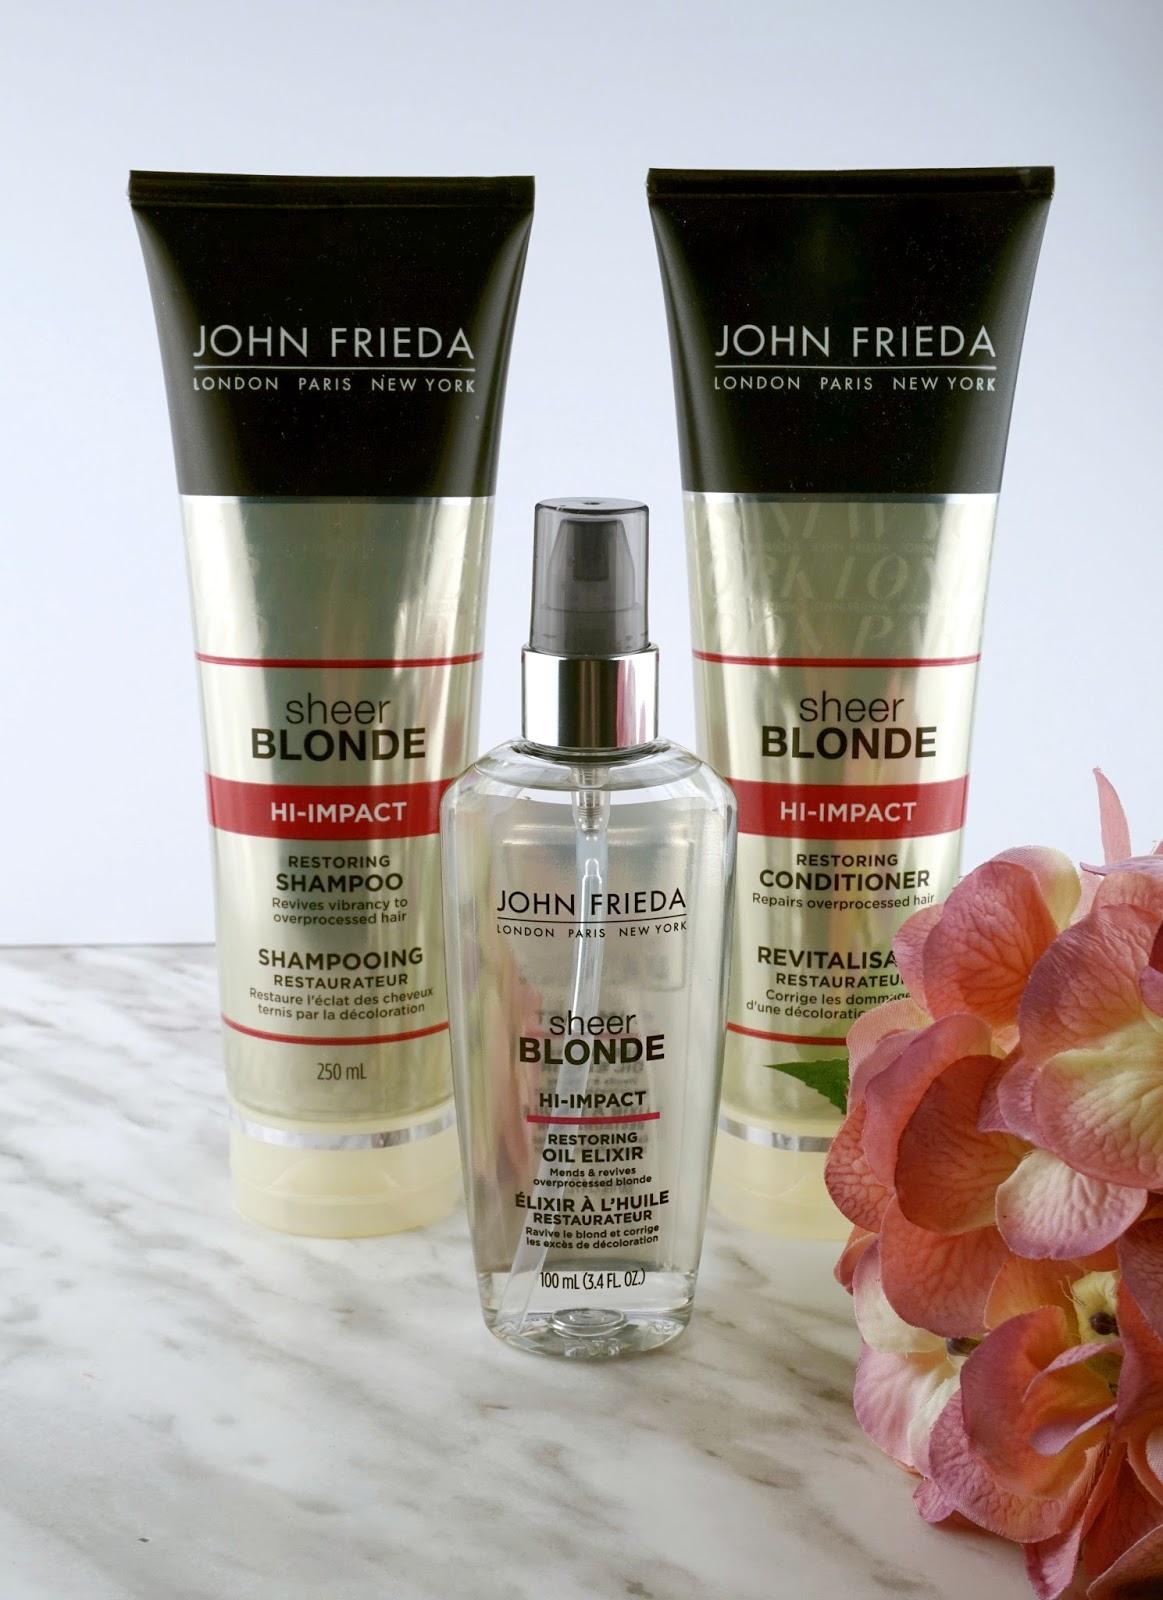 john frieda hi impact sheer blonde shampoo conditioner oil elixir review